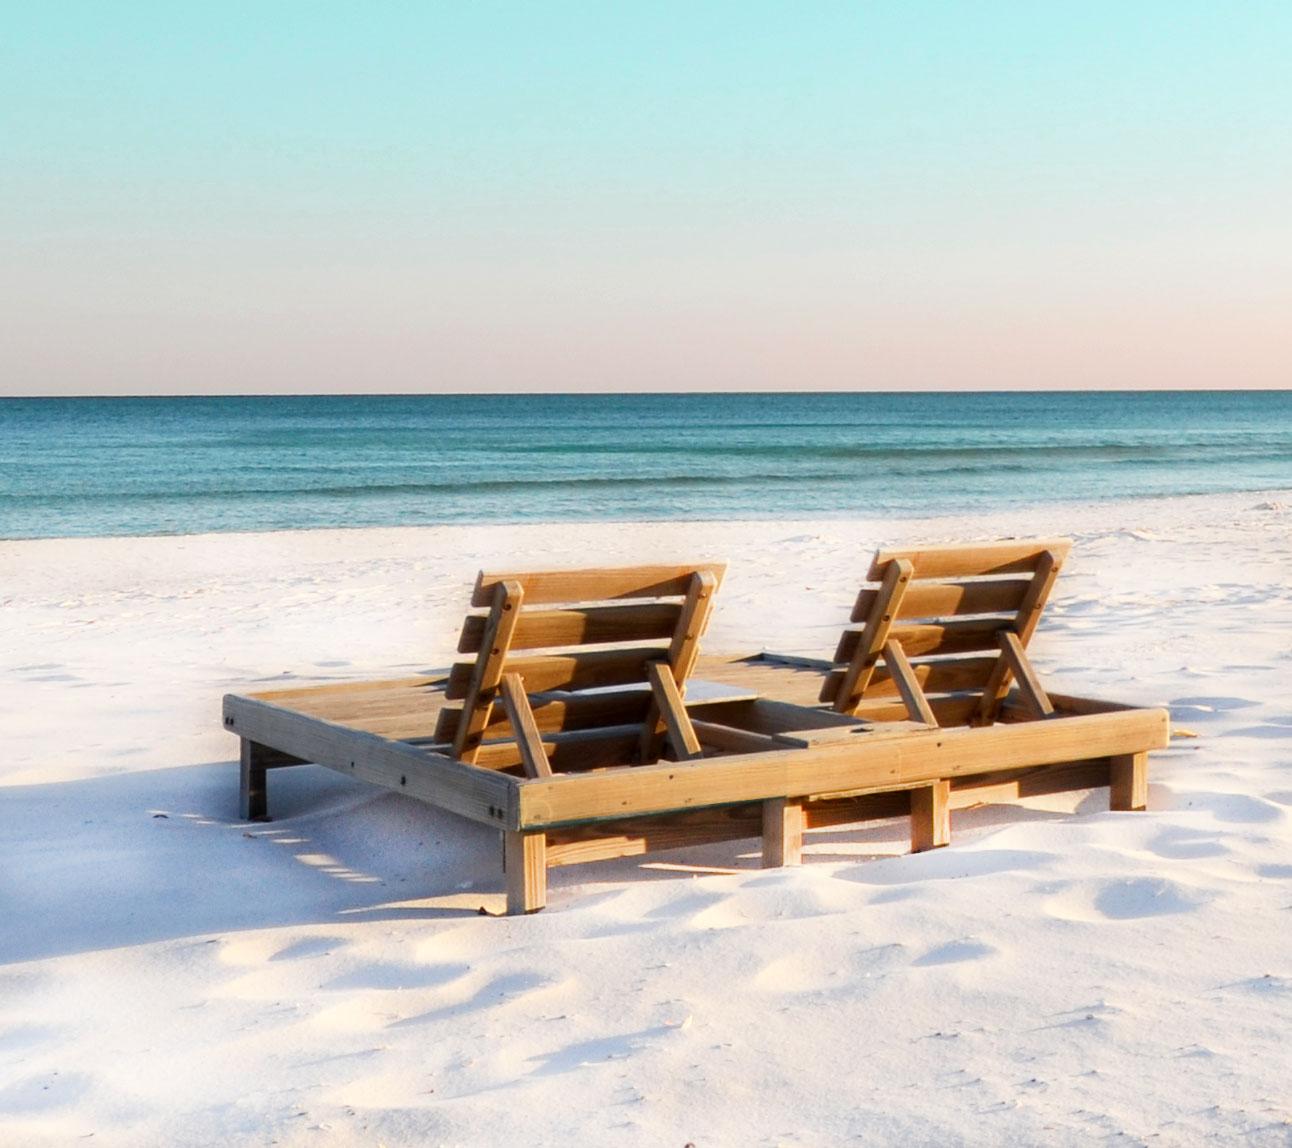 Perdido Key Fl: Mom's Day Gift Alert: Florida Beach Vacation